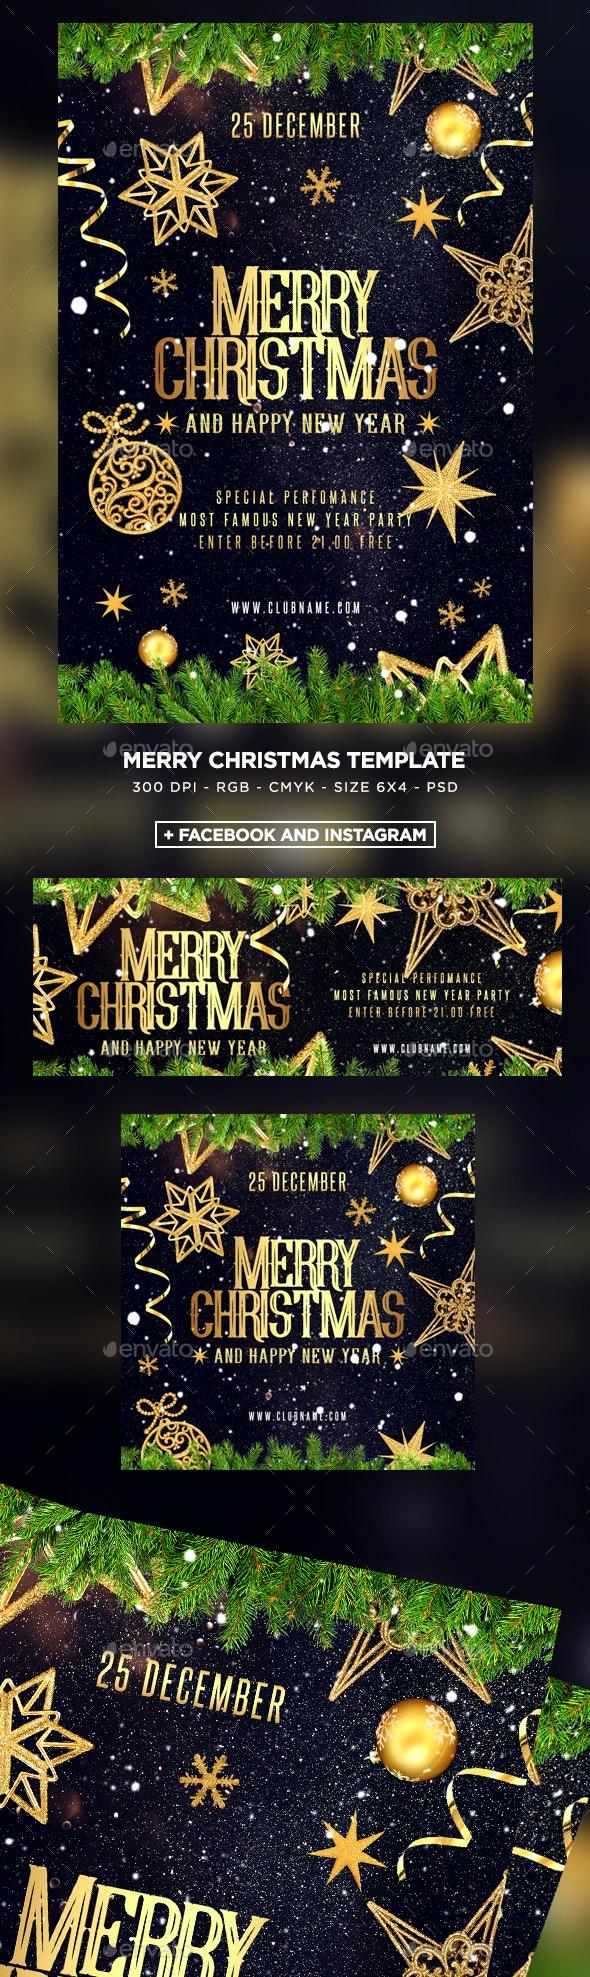 Christmas Flyers.Merry Christmas Flyer